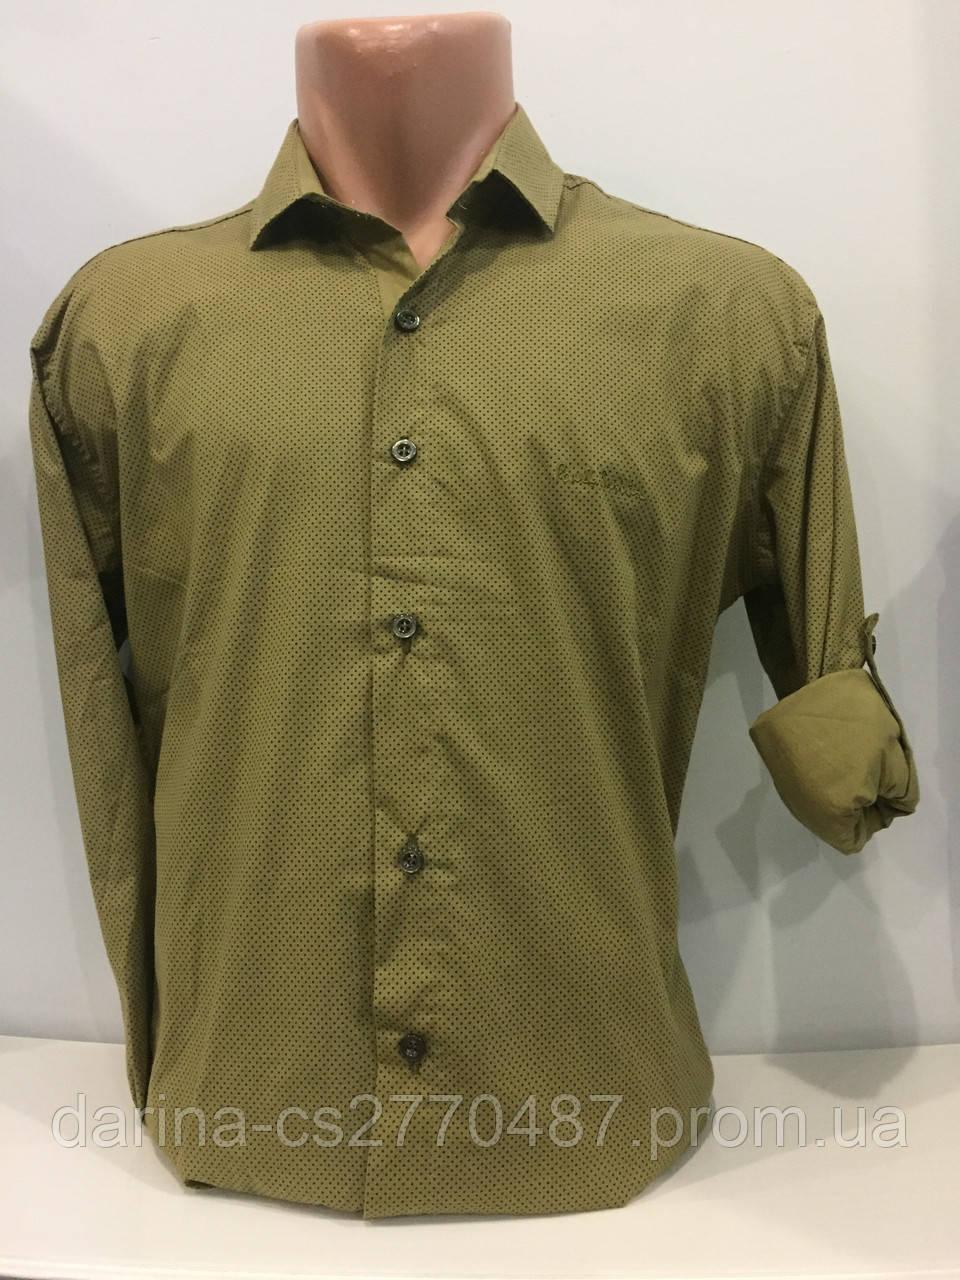 Мужская рубашка на пуговицах M,XL,2XL